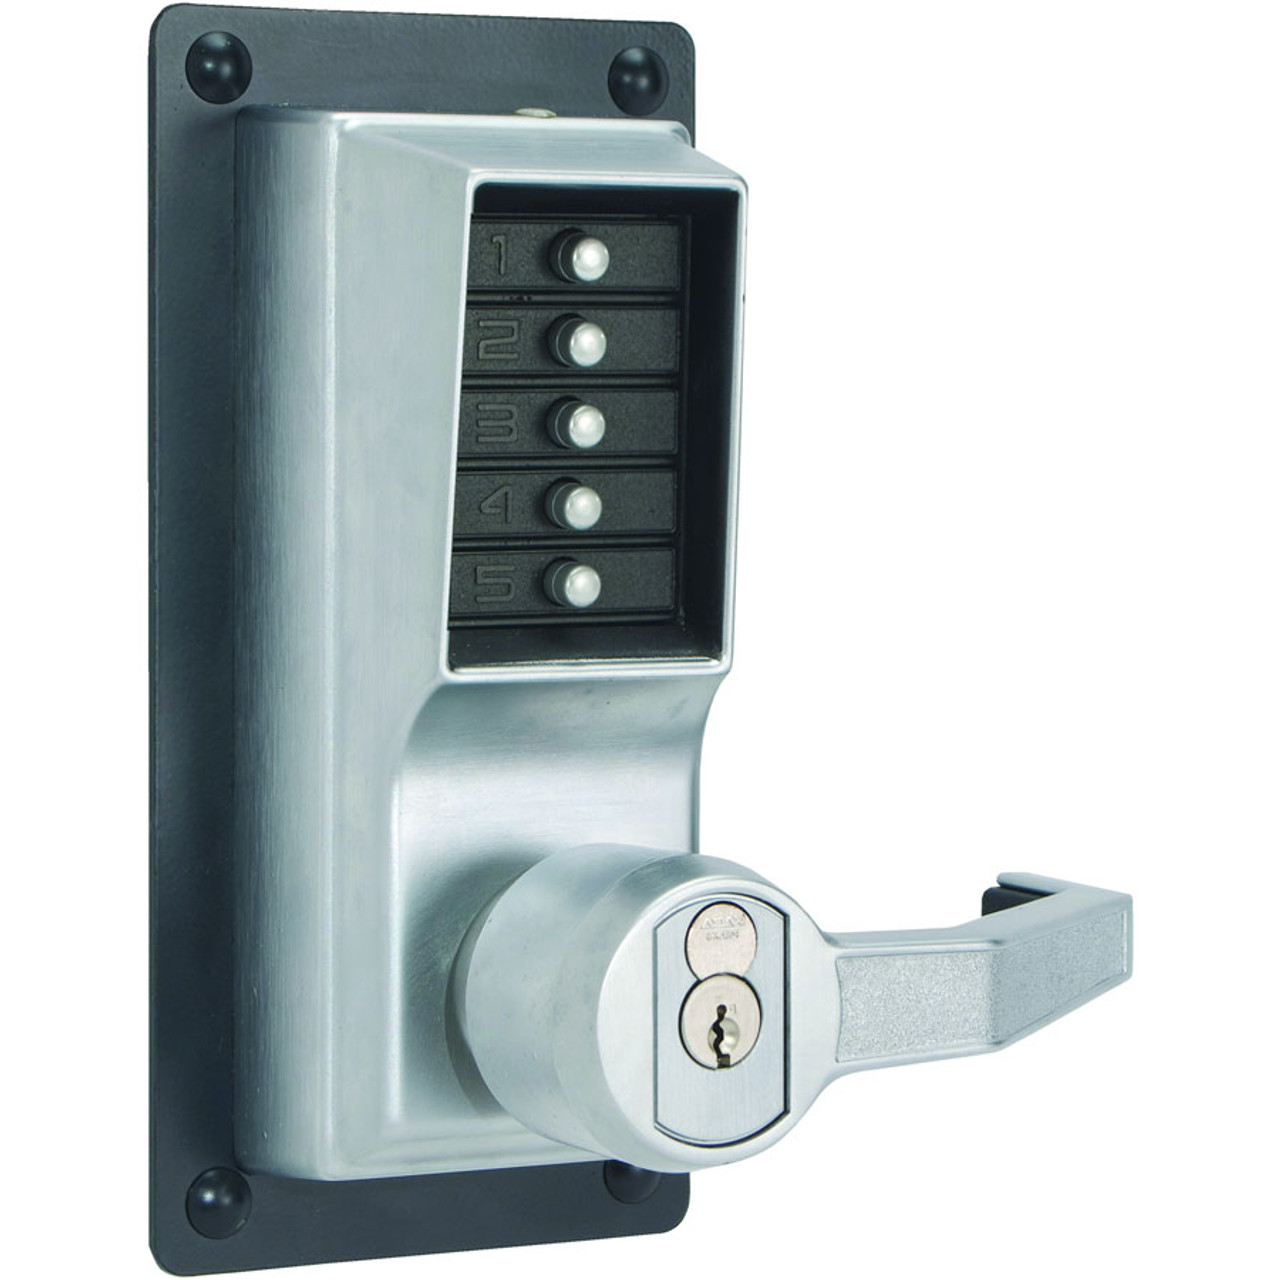 Kaba Ilco Lp1020 Simplex Mechanical Pushbutton Entry